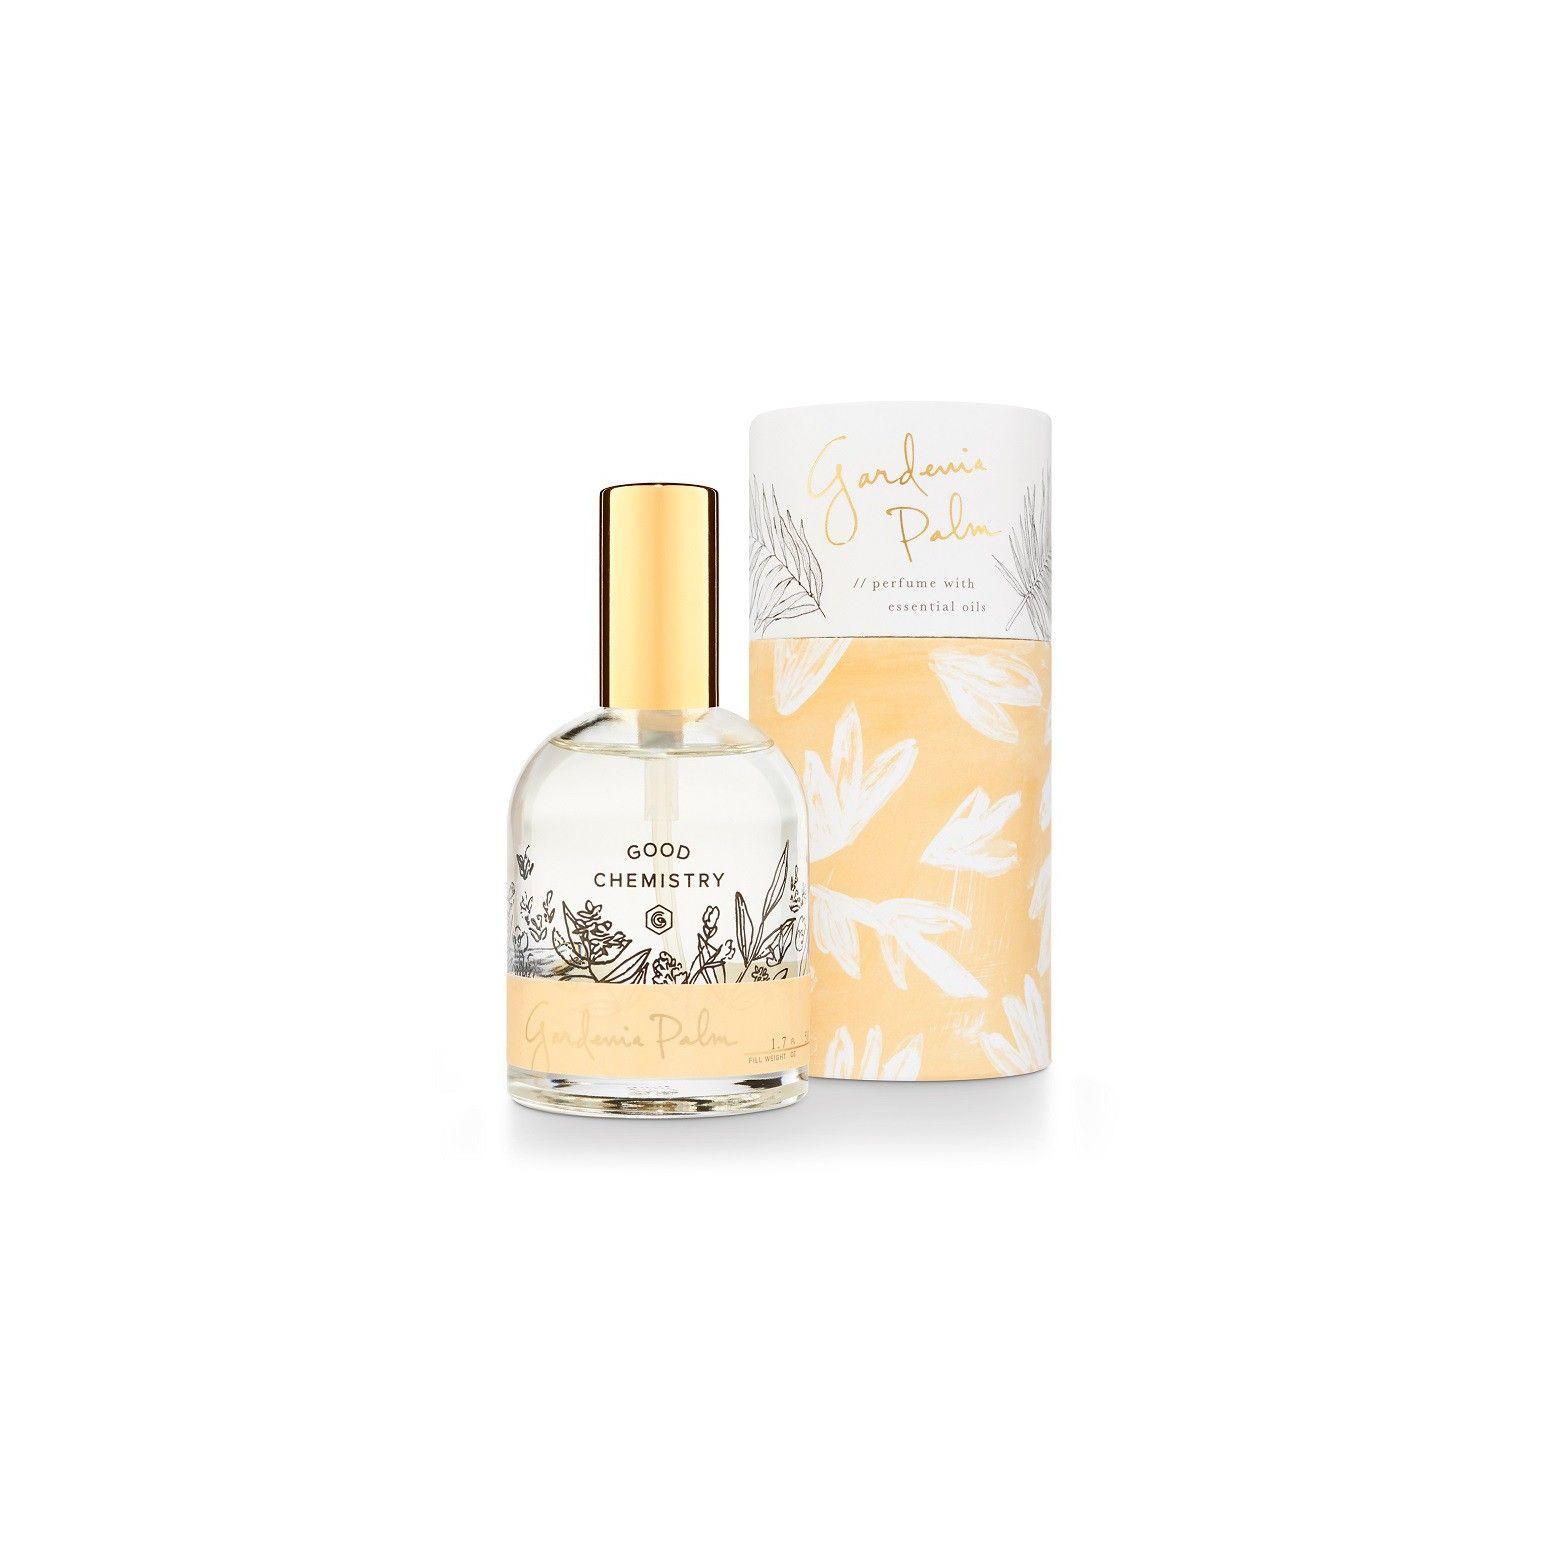 Gardenia Palm By Good Chemistry Eau De Parfum Women S Perfume